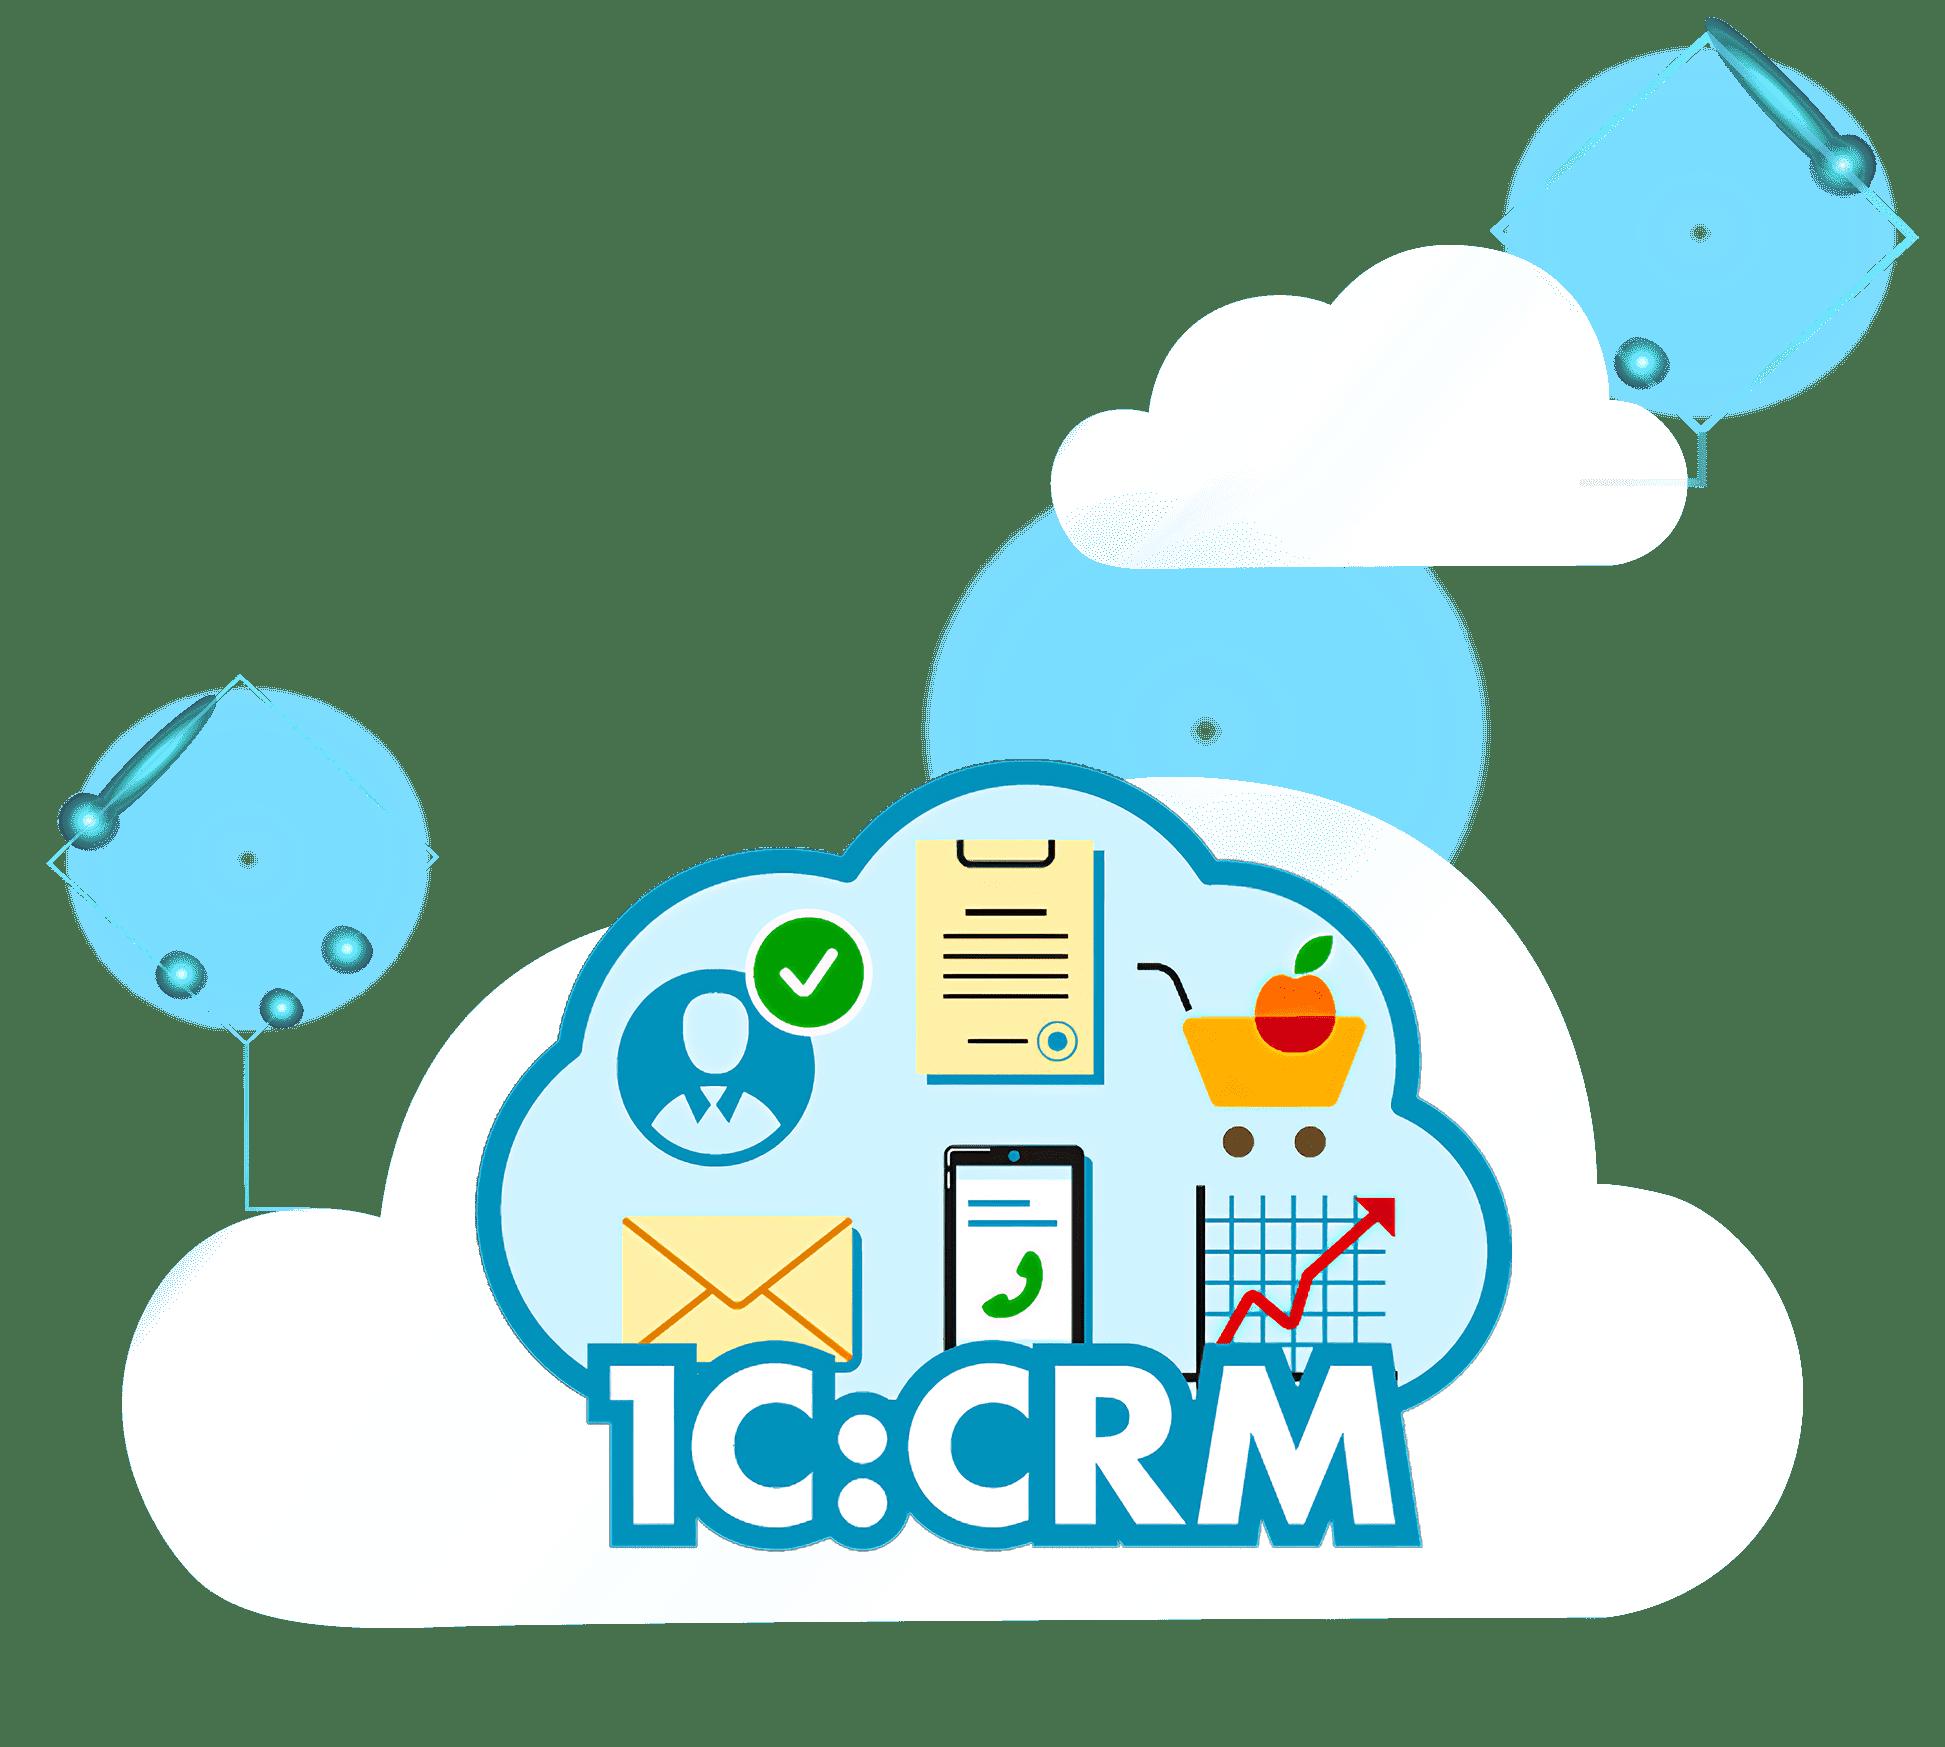 1C:CRM в облаке